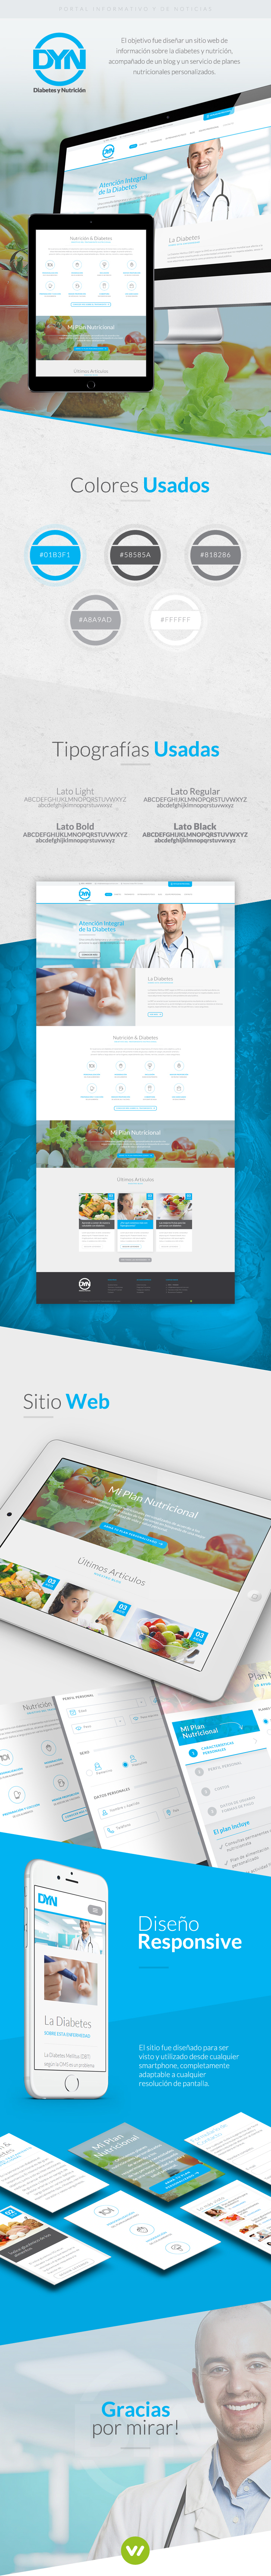 Portal Web de Informacion